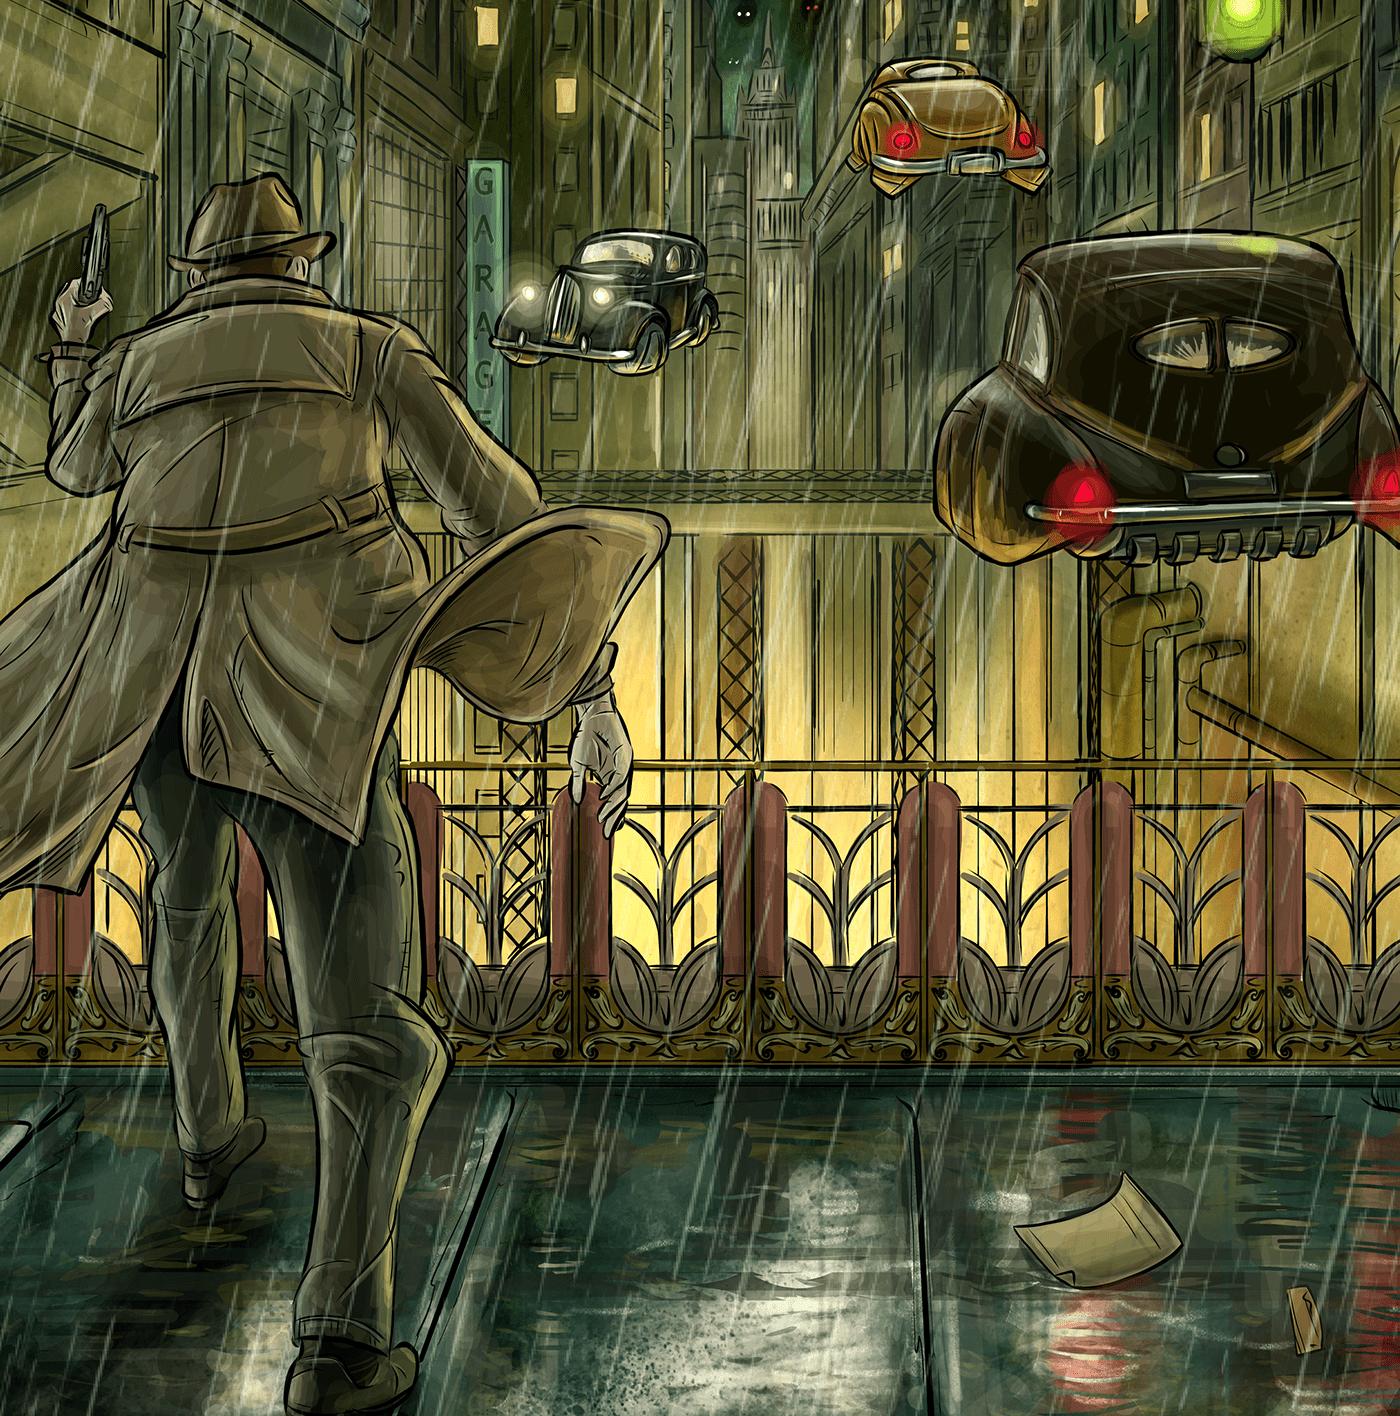 city comic detective dieselpunk film noir noir Retro retro future